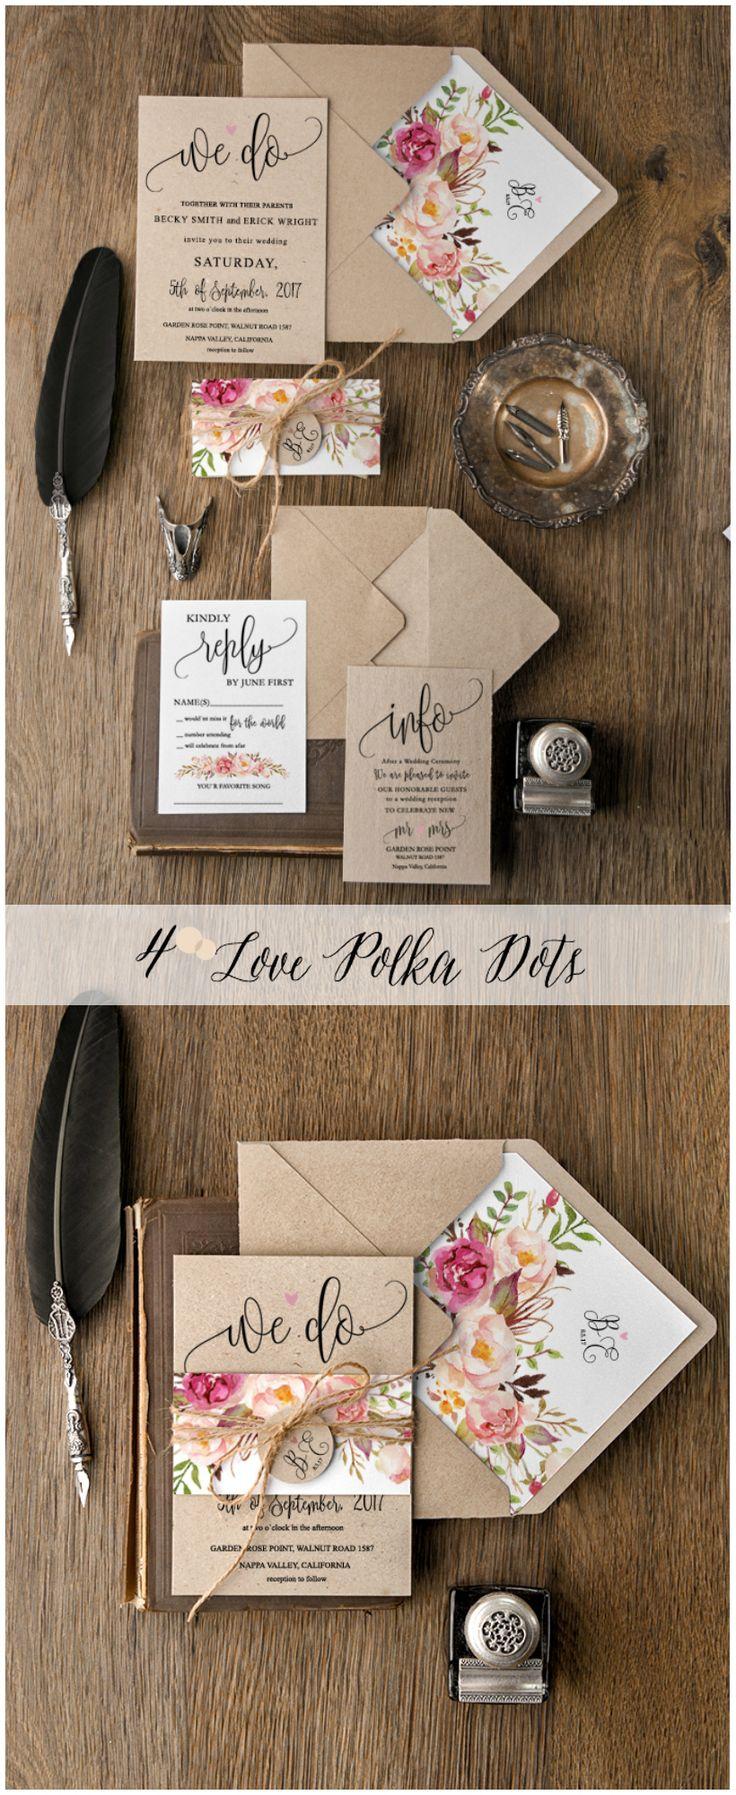 We Do ! Wedding Invitations